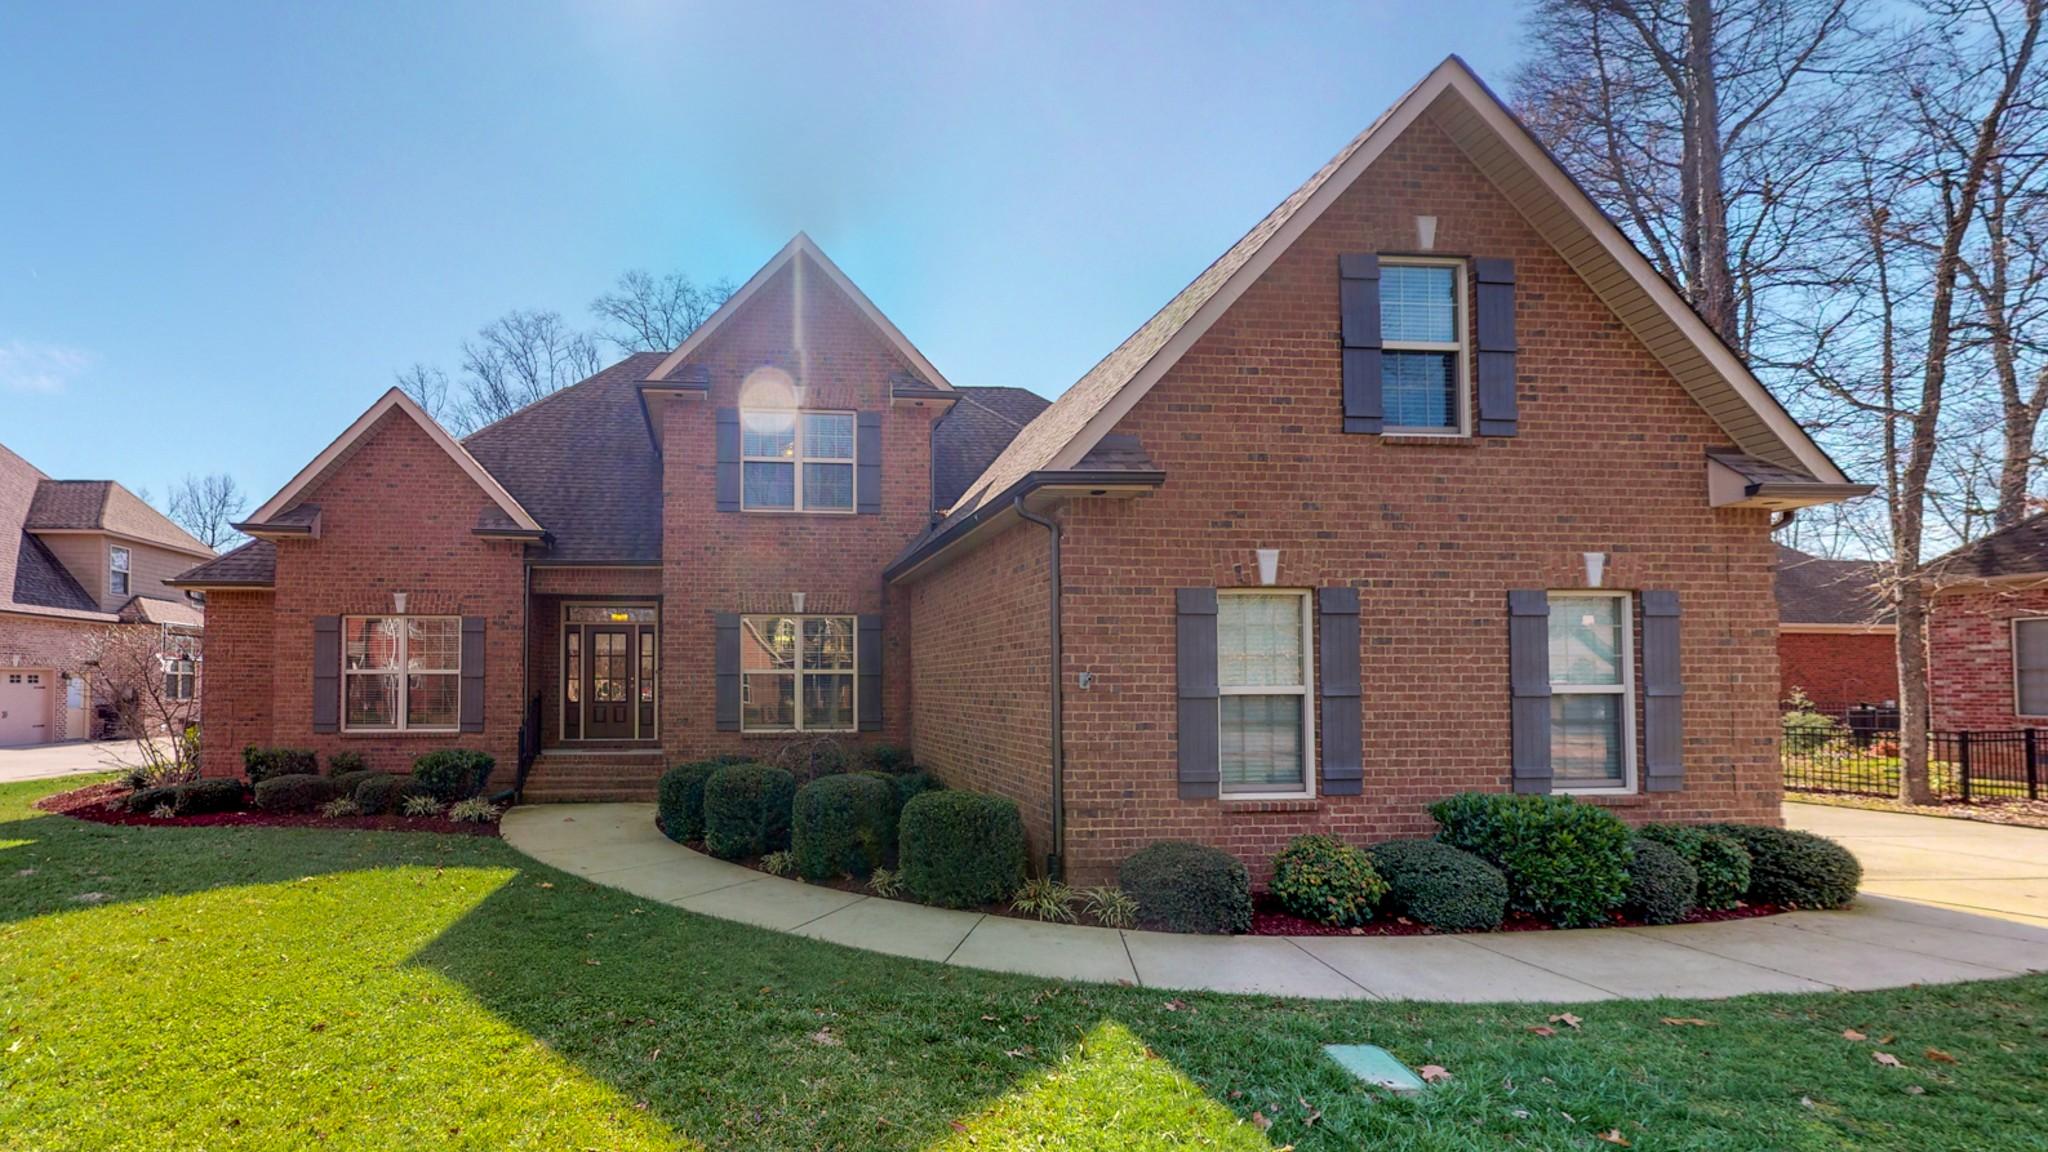 4527 Tombee Ct, Murfreesboro, TN 37128 - Murfreesboro, TN real estate listing